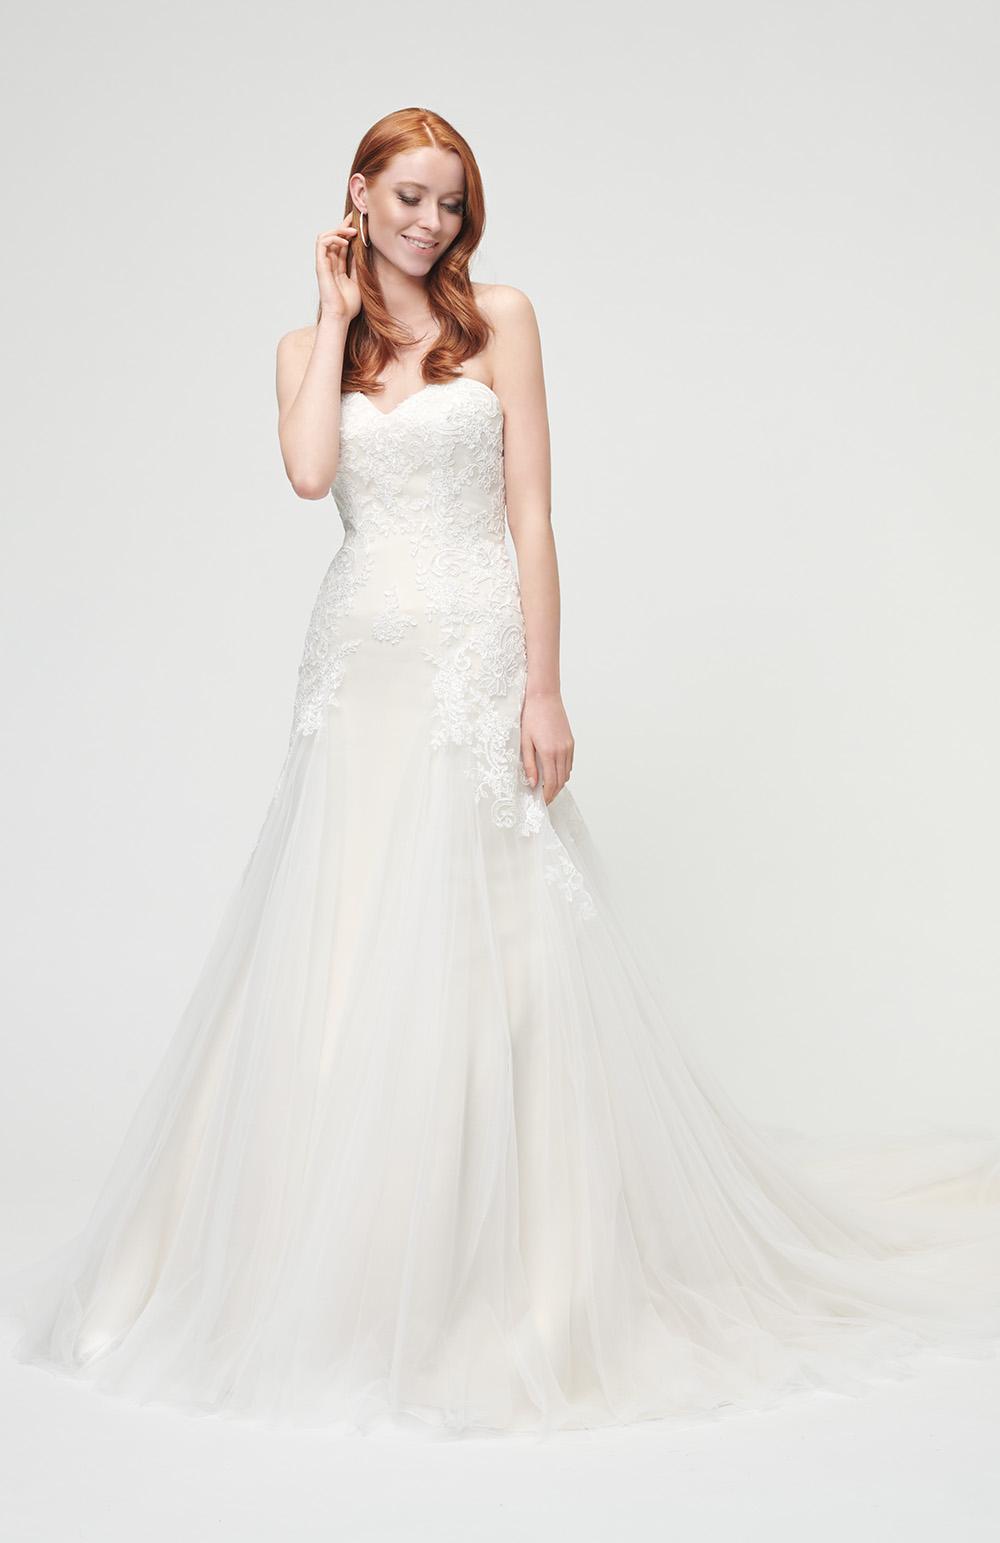 Robe de mariée Modèle Rym